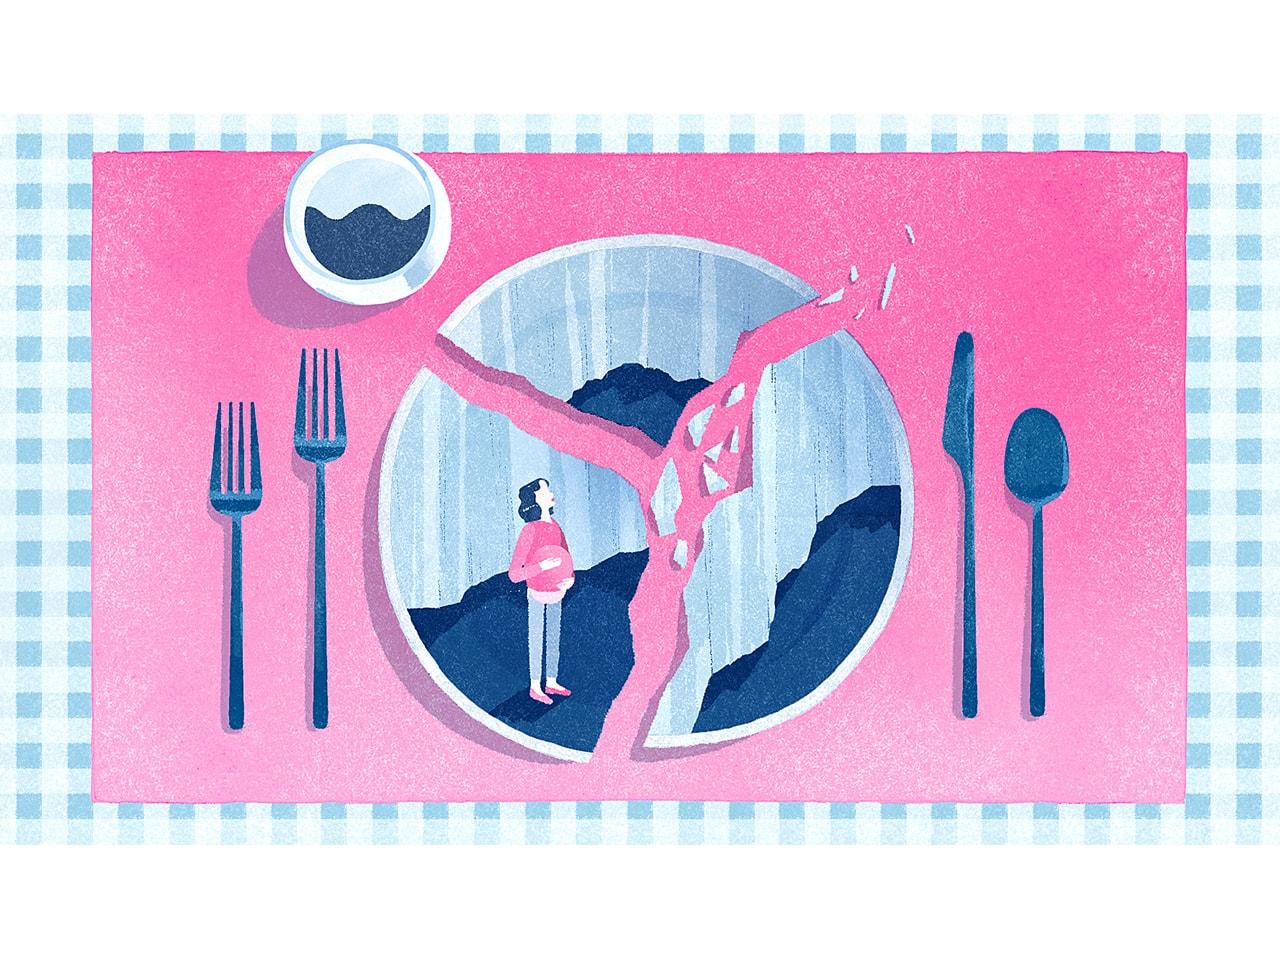 Pregnancy - Eating